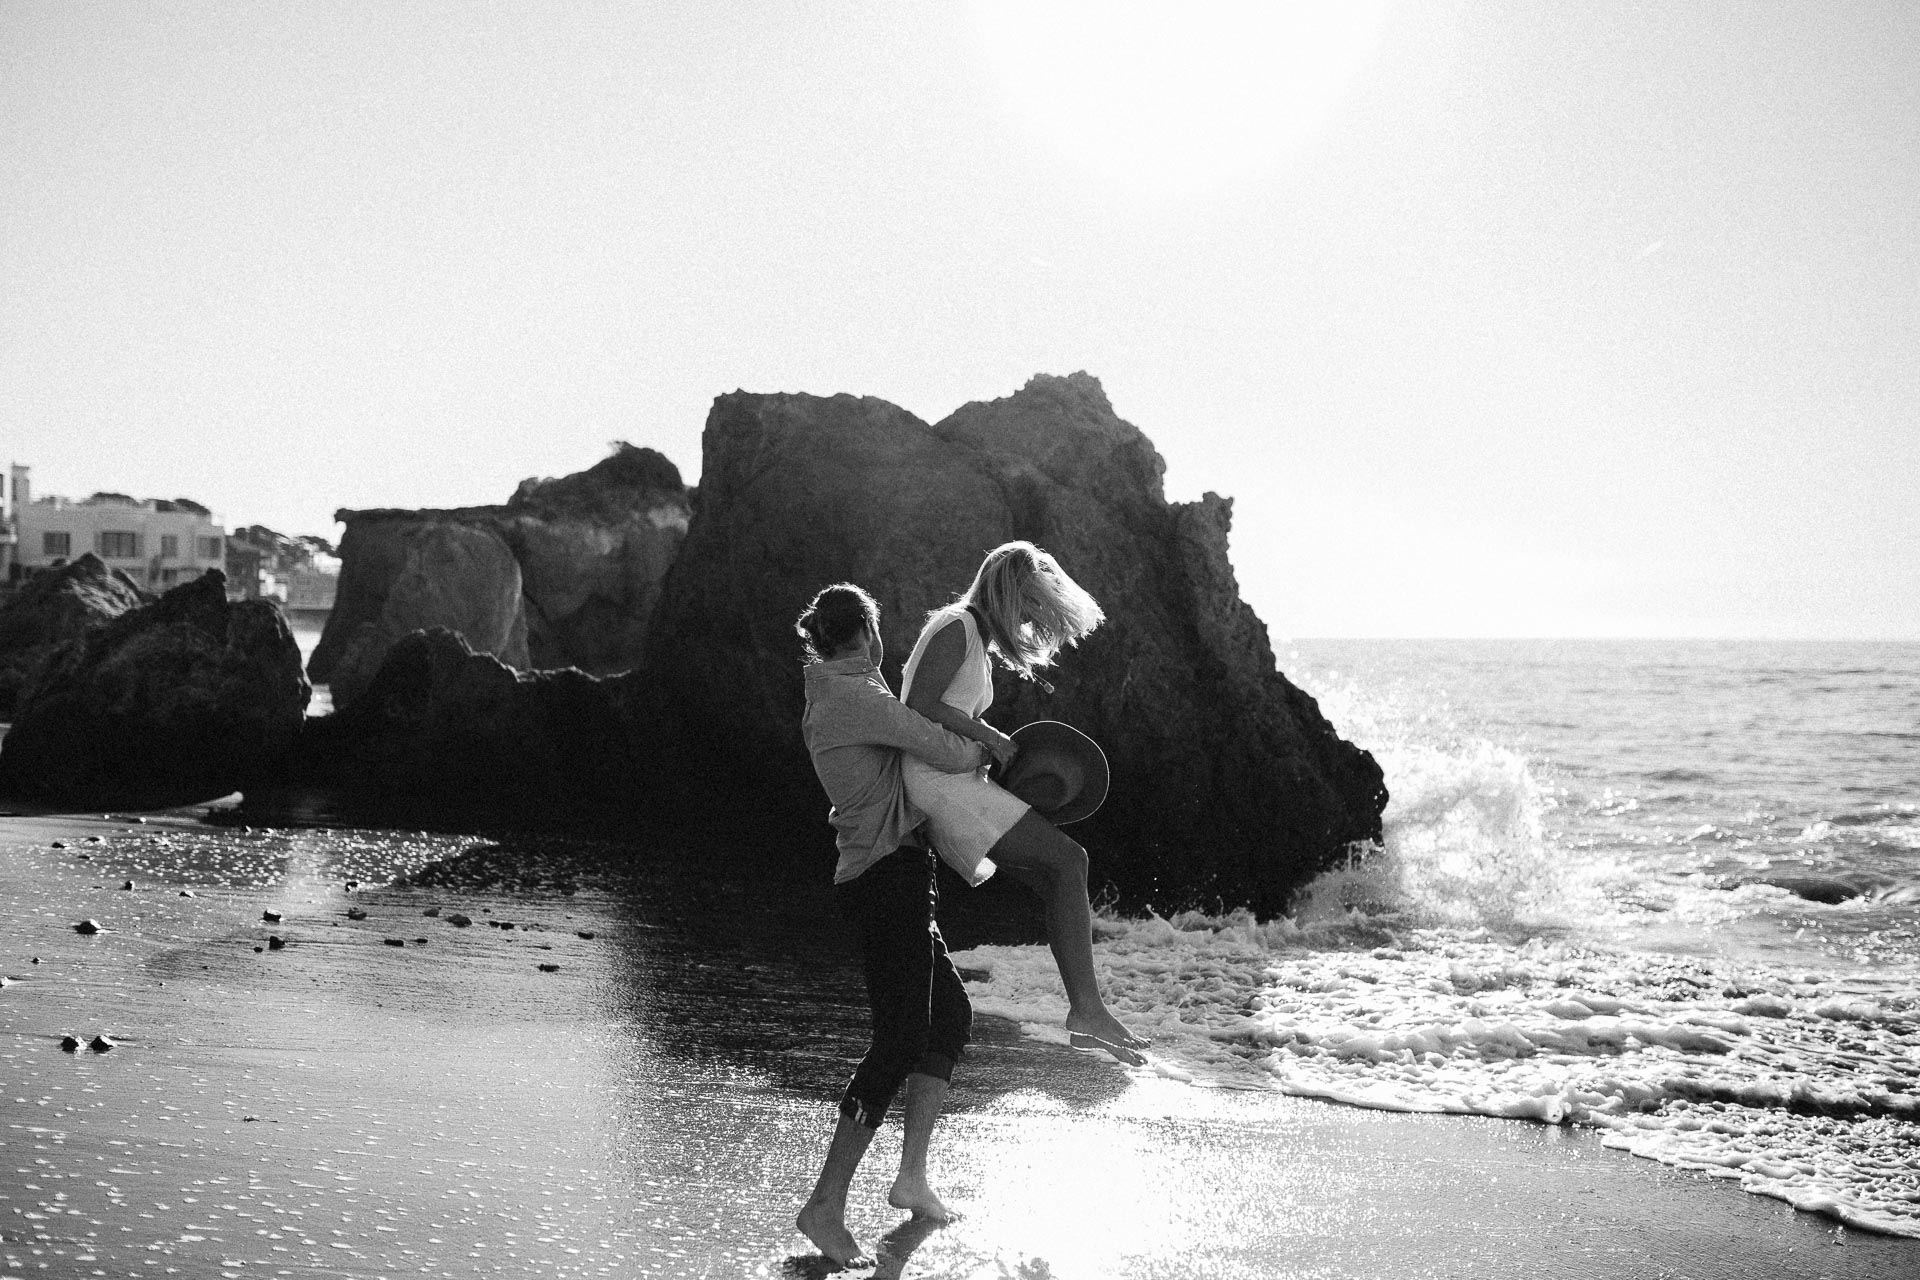 Carley_Jake_Lovesession_California_LosAngeles_ElMatadorBeach_JeanLaurentGaudy_033